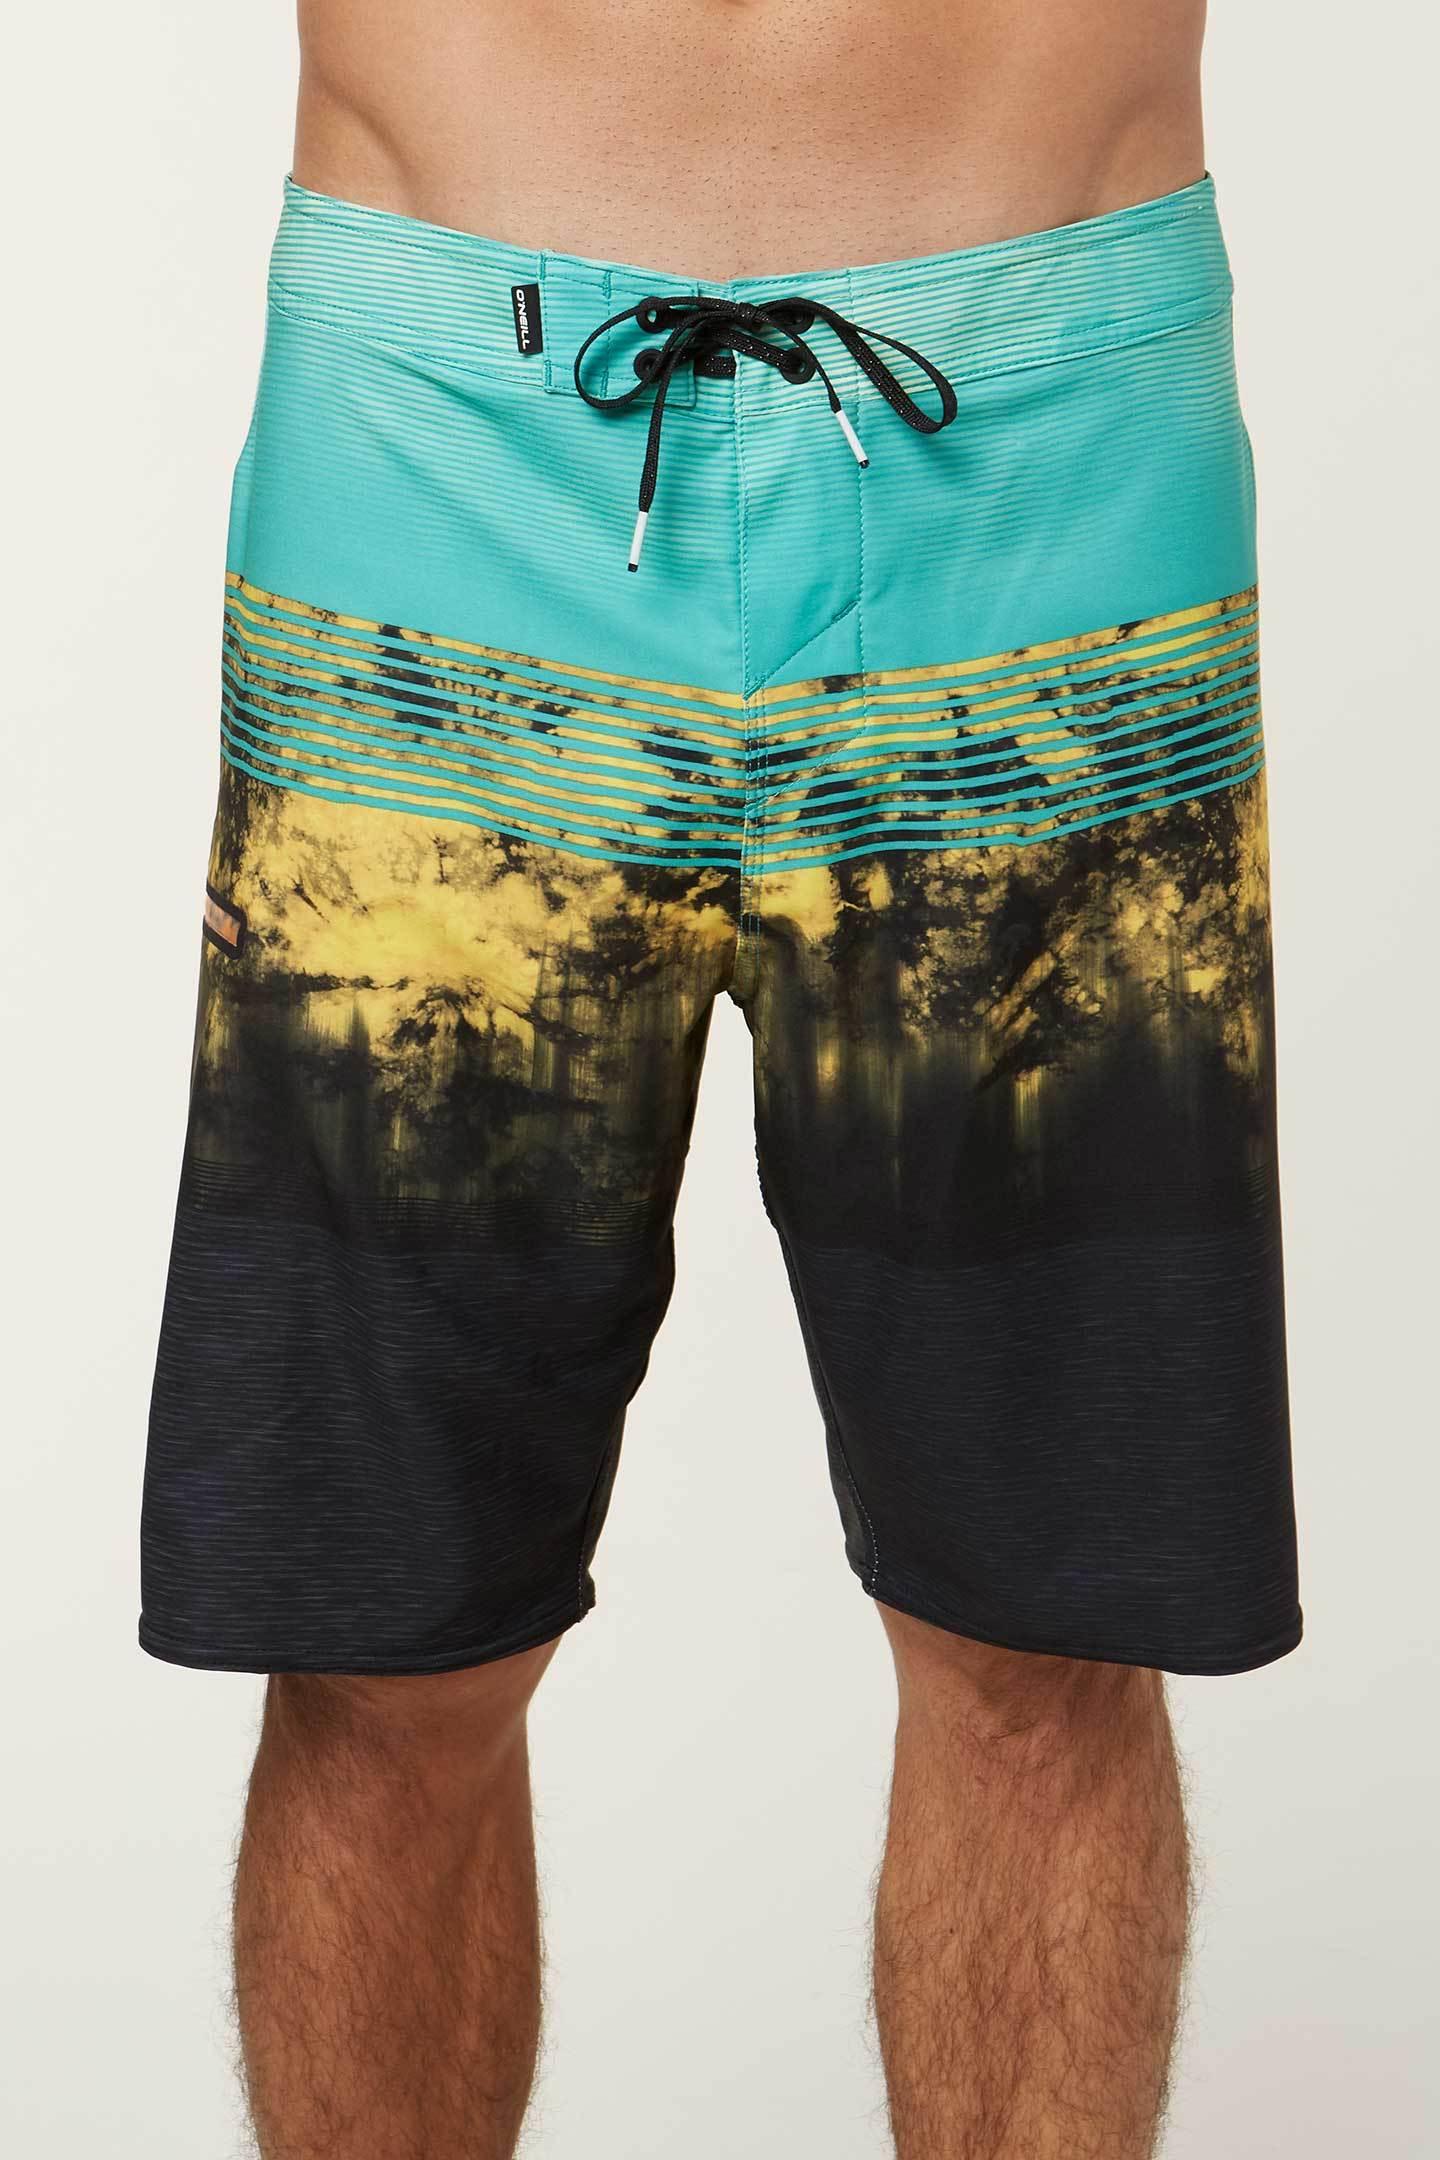 1f2d11e01f Oneill Hyperfreak Boardshorts Mens Aqua   eBay